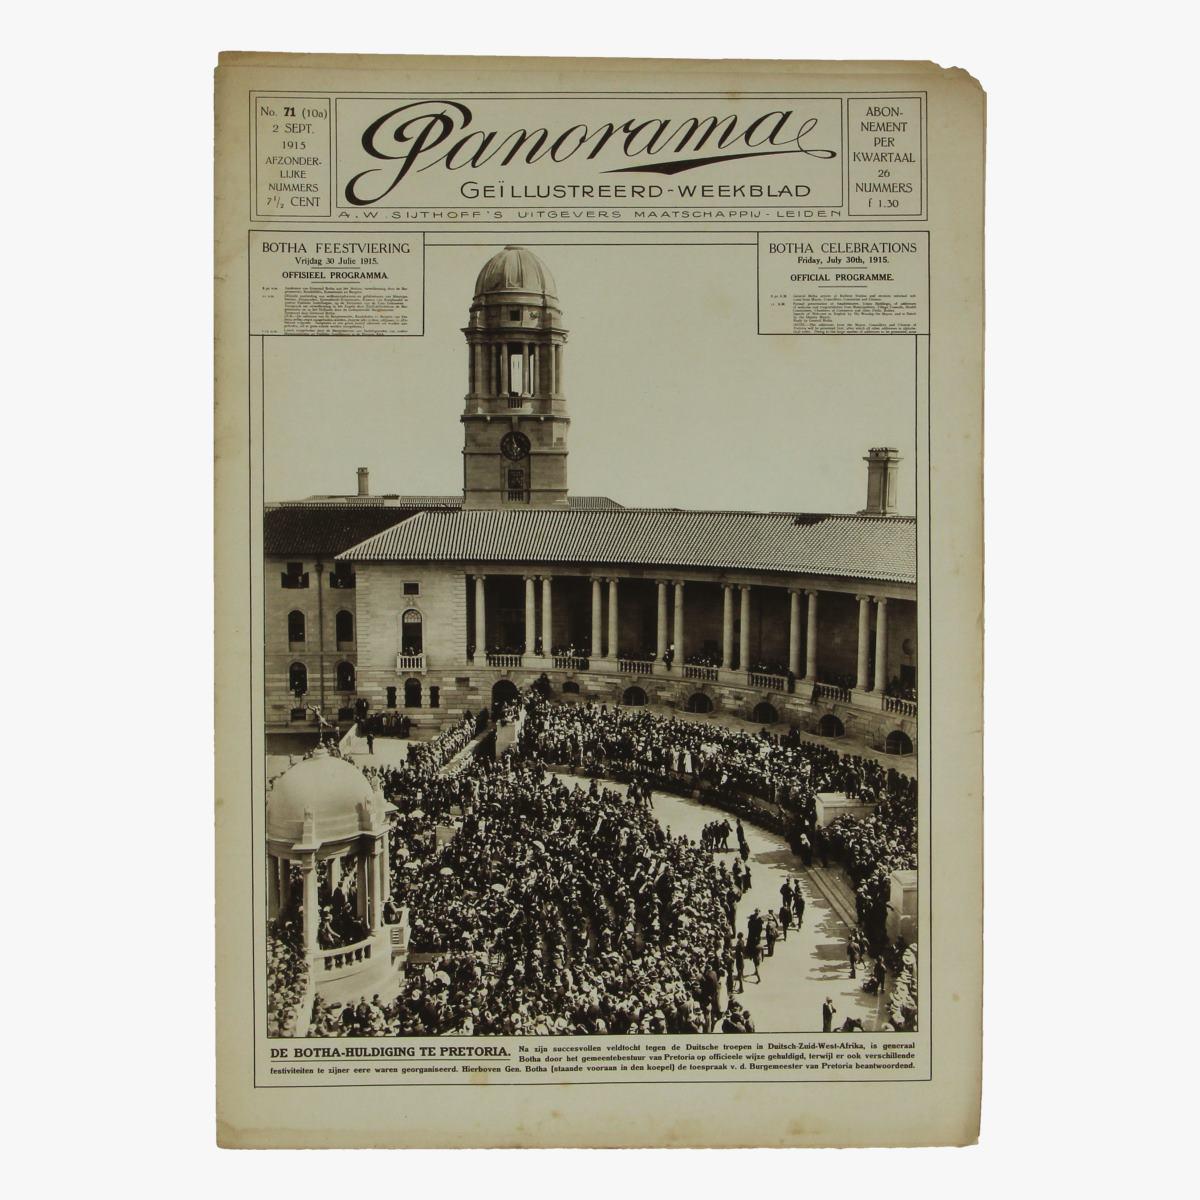 Afbeeldingen van oude weekblad panorama N°71  2 sept 1915